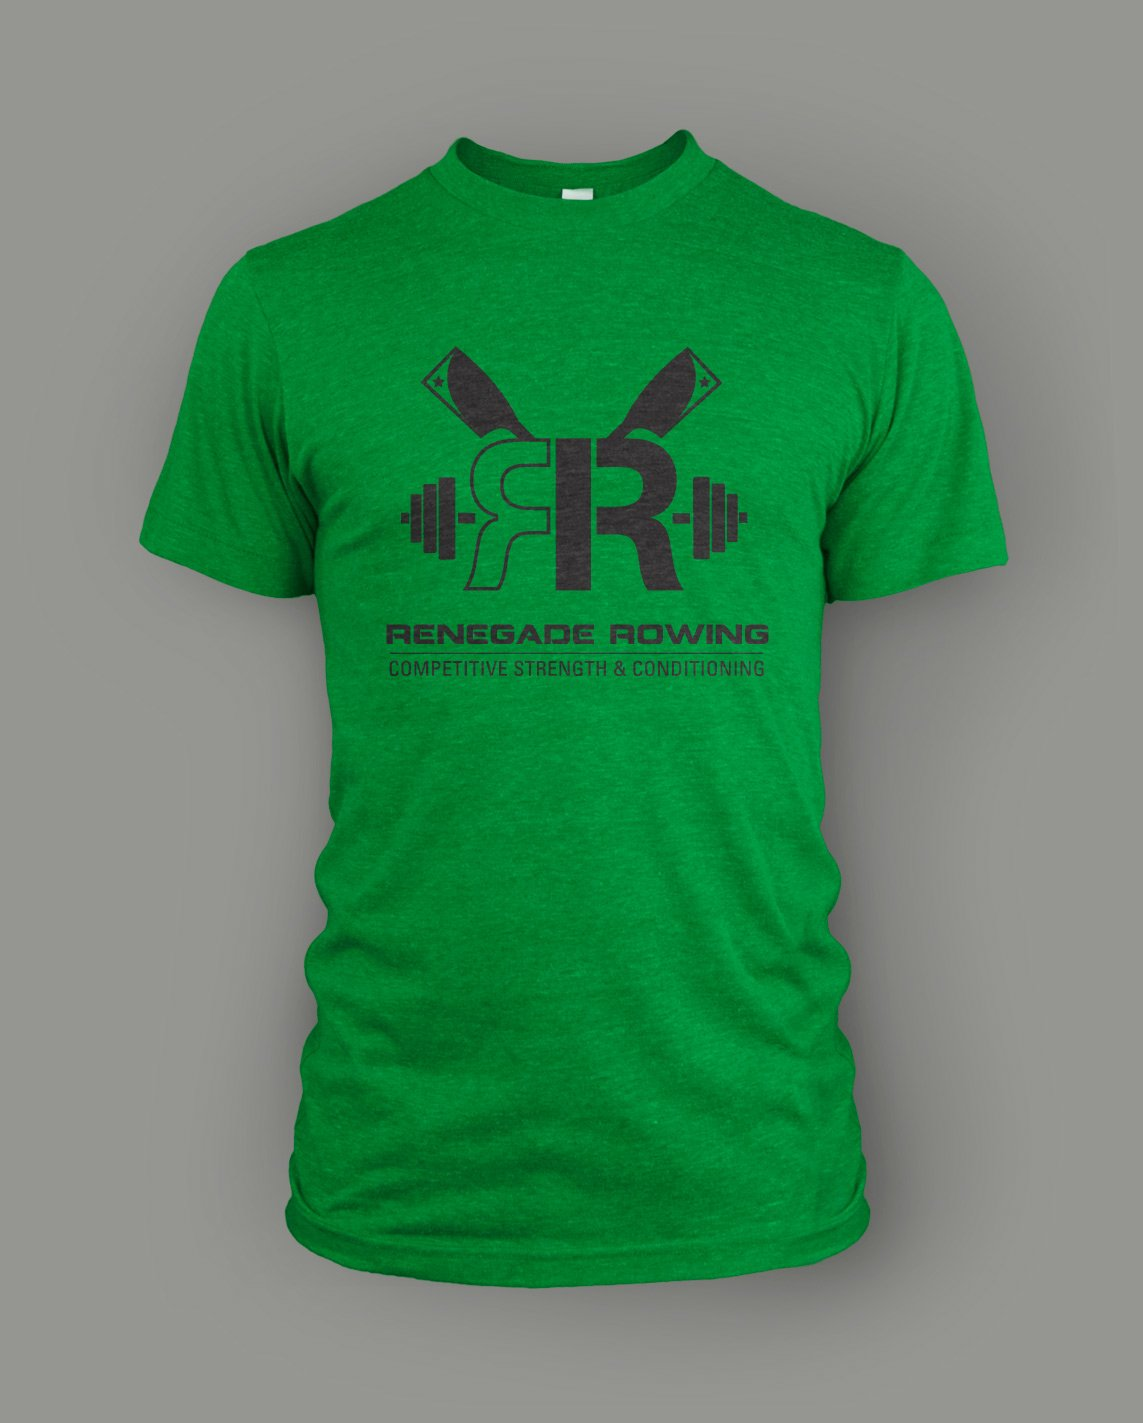 renegade rowing screen printed triblend t-shirt